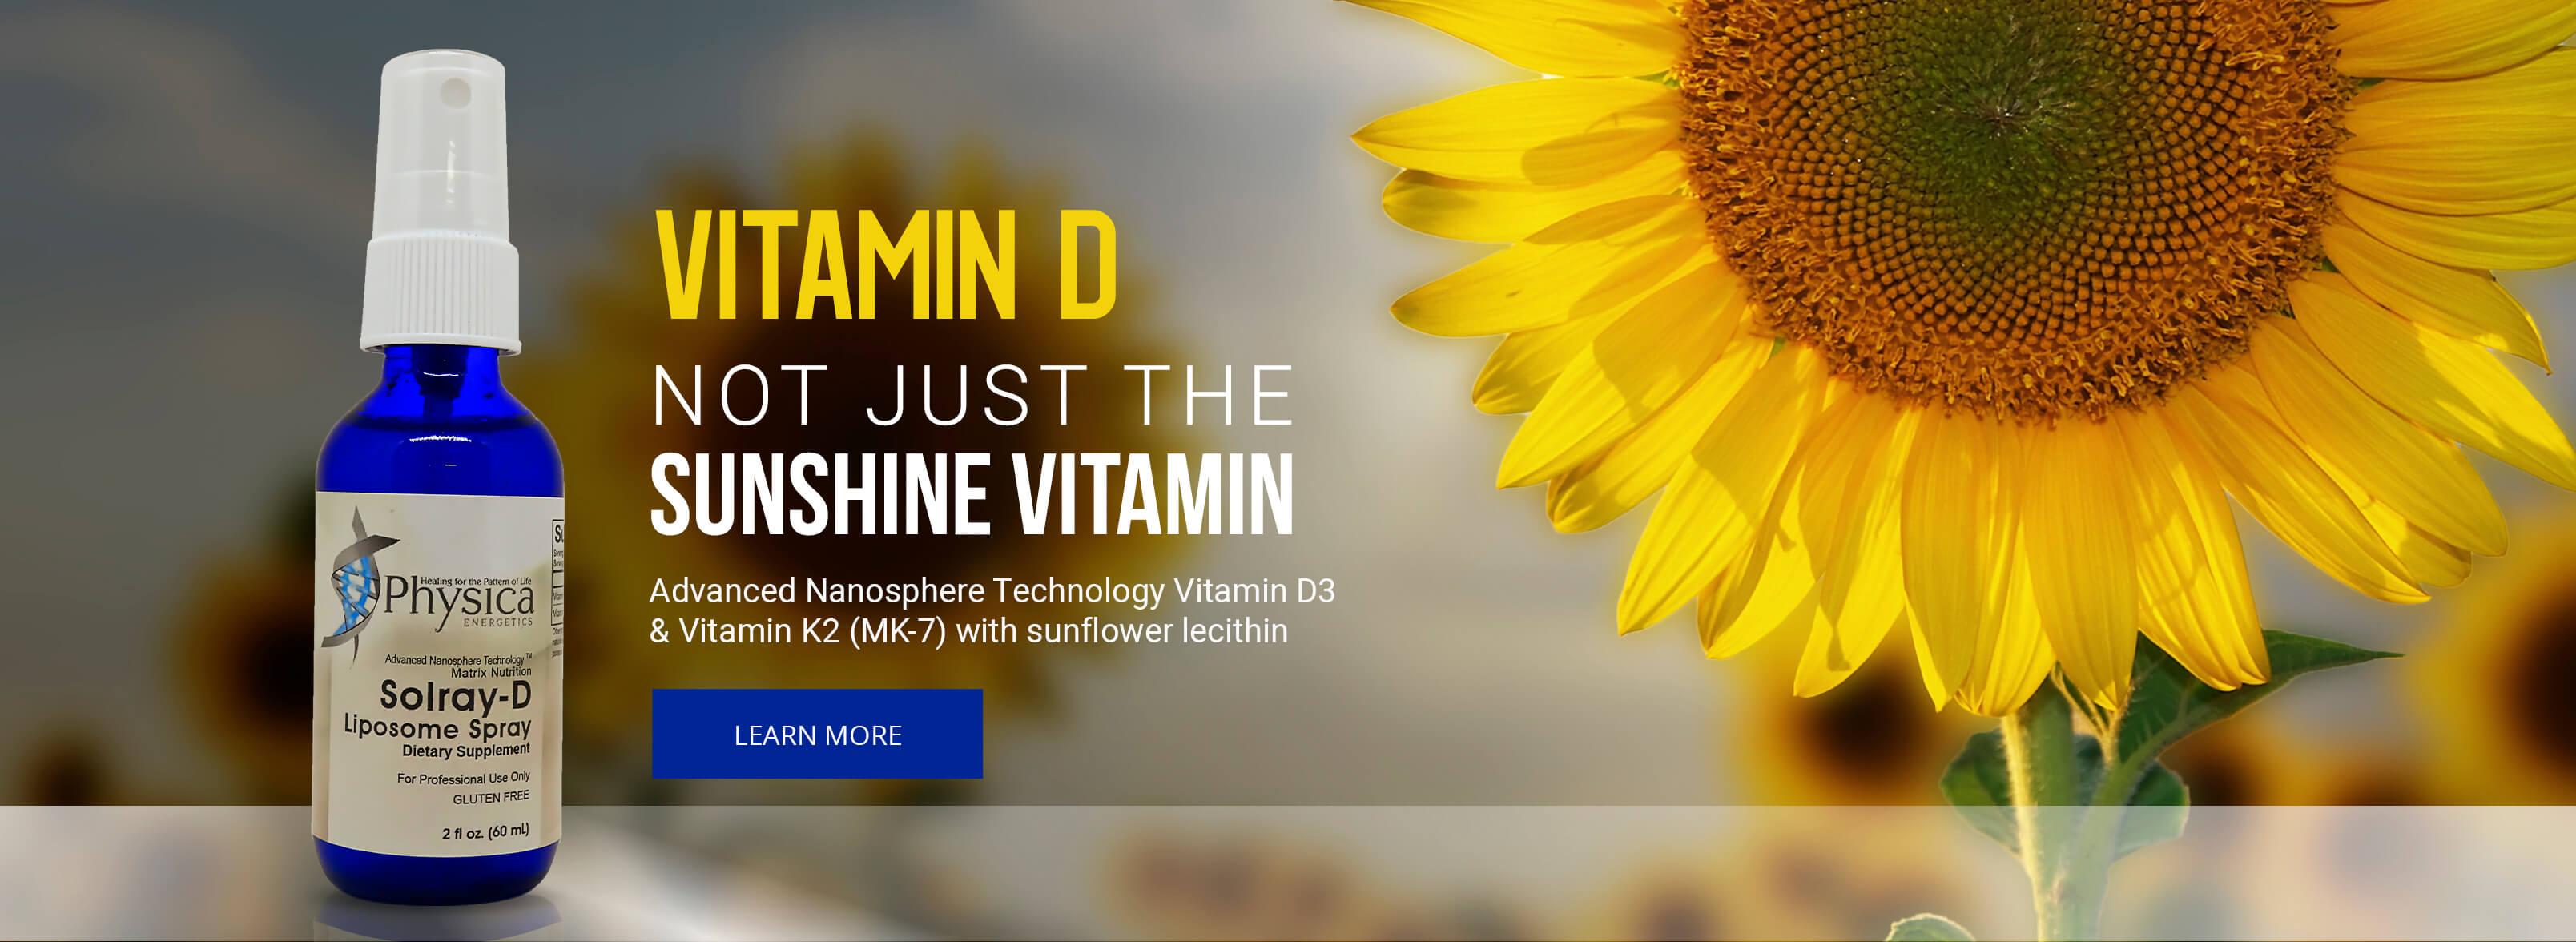 Not Just The Sunshine Vitamin